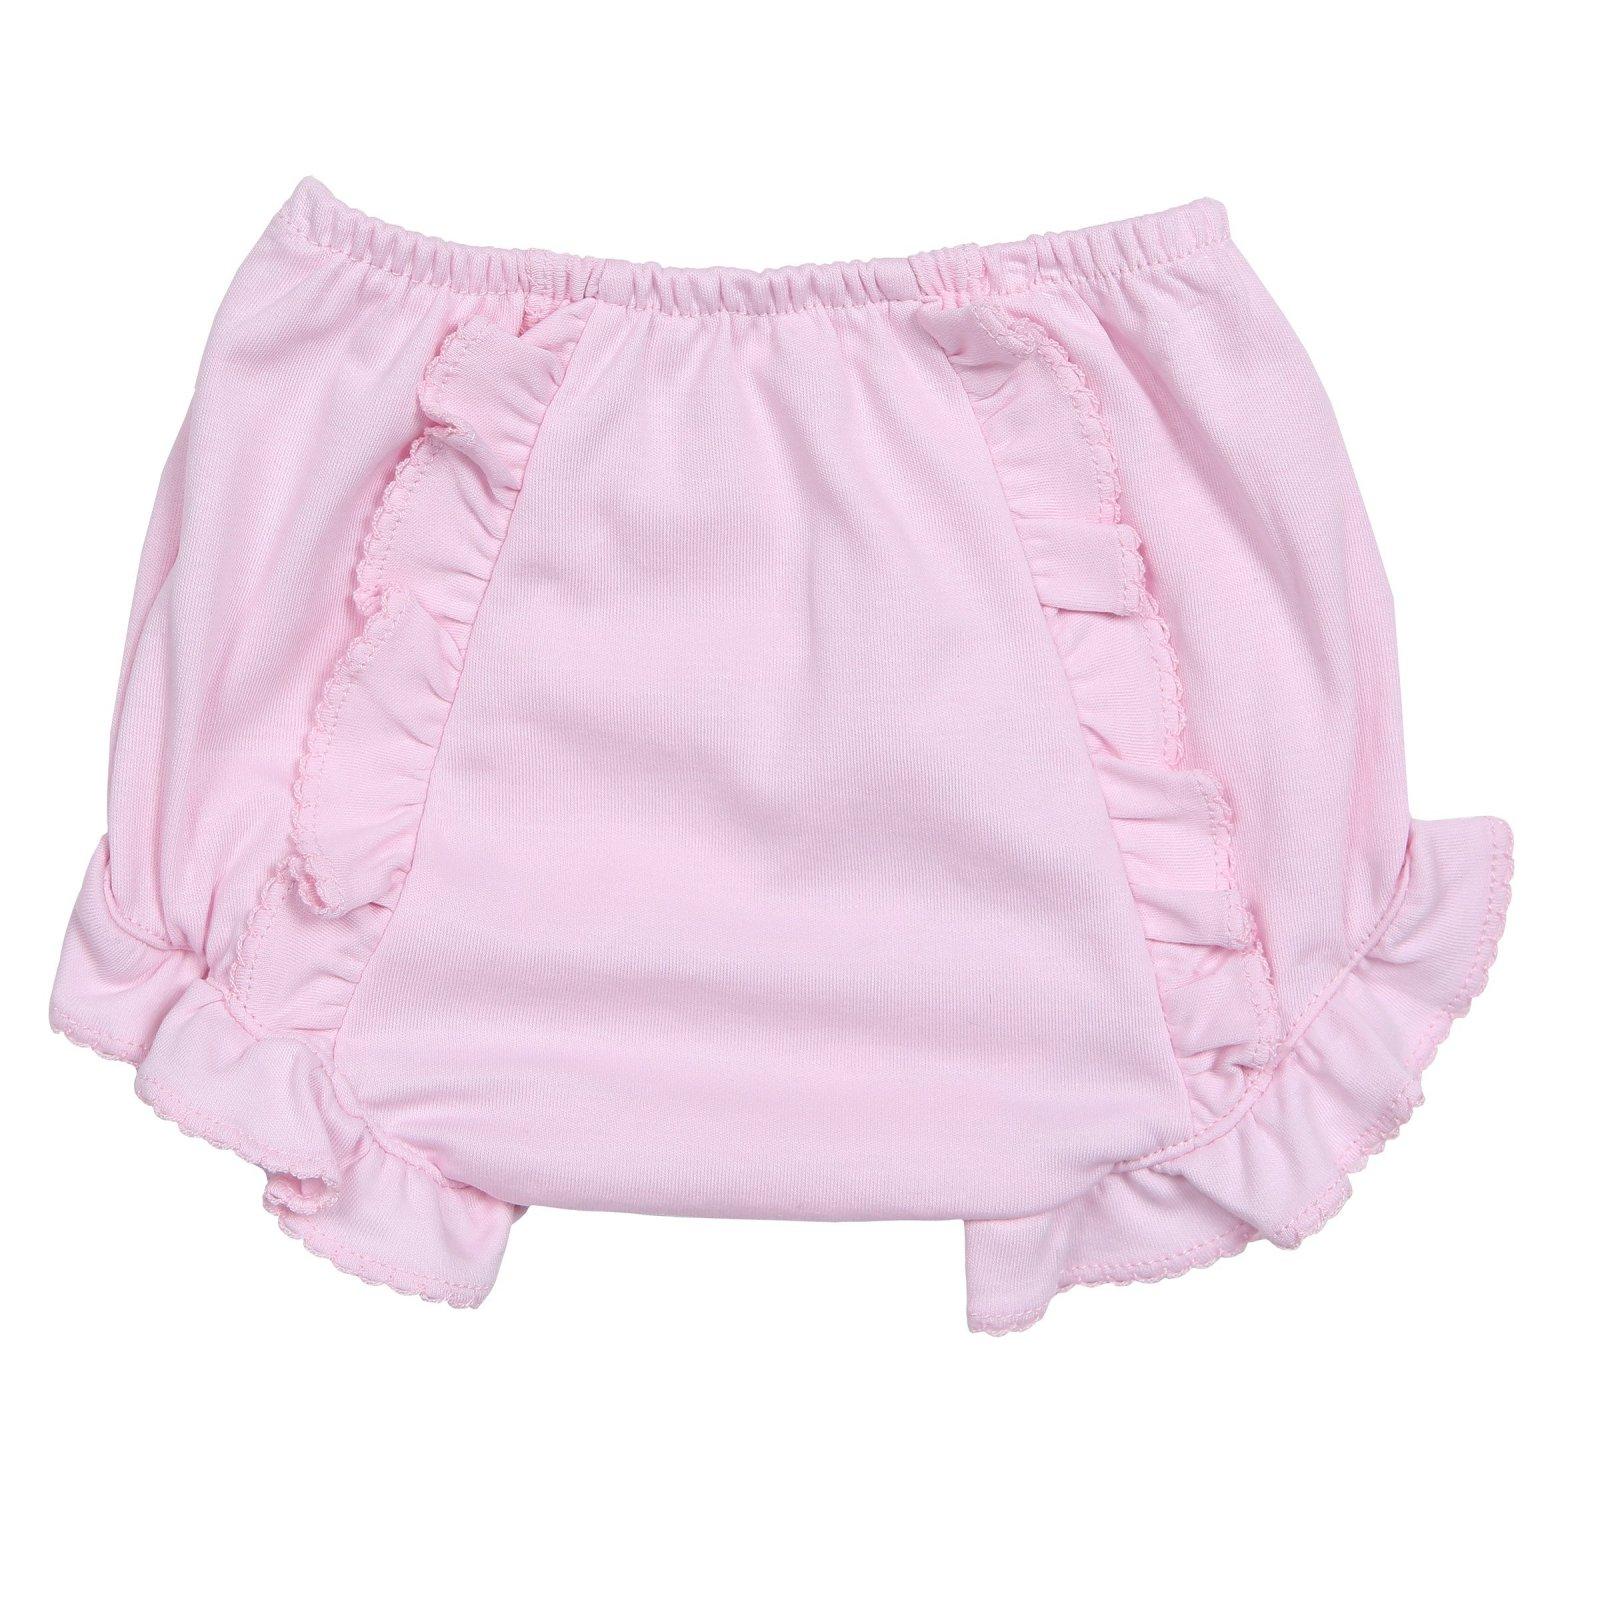 Essentials Pink Bloomers